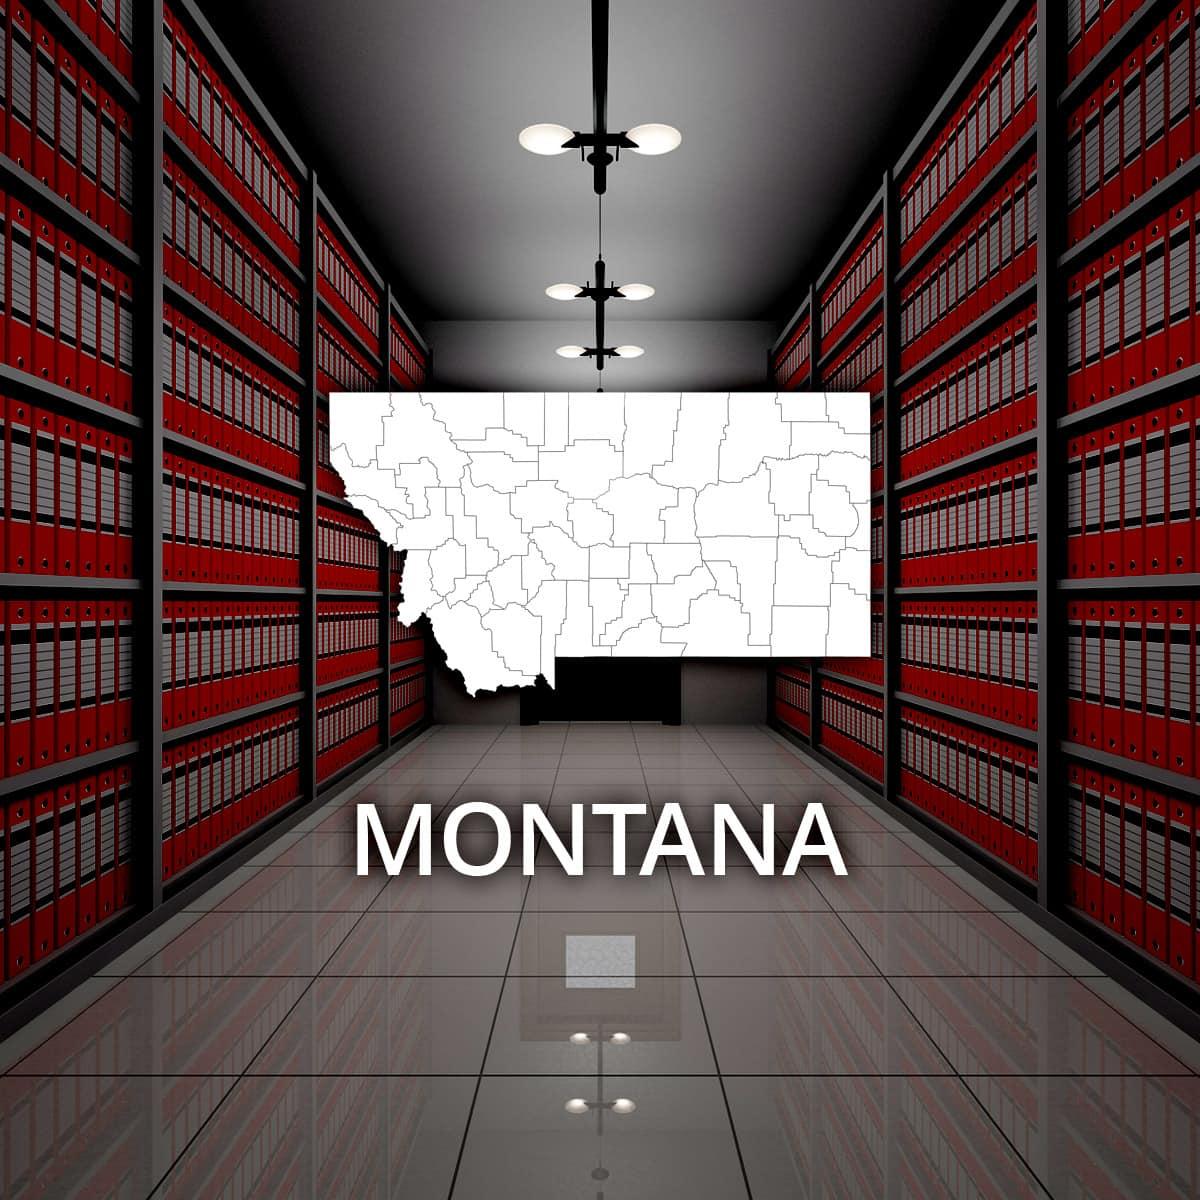 Montana Public Records